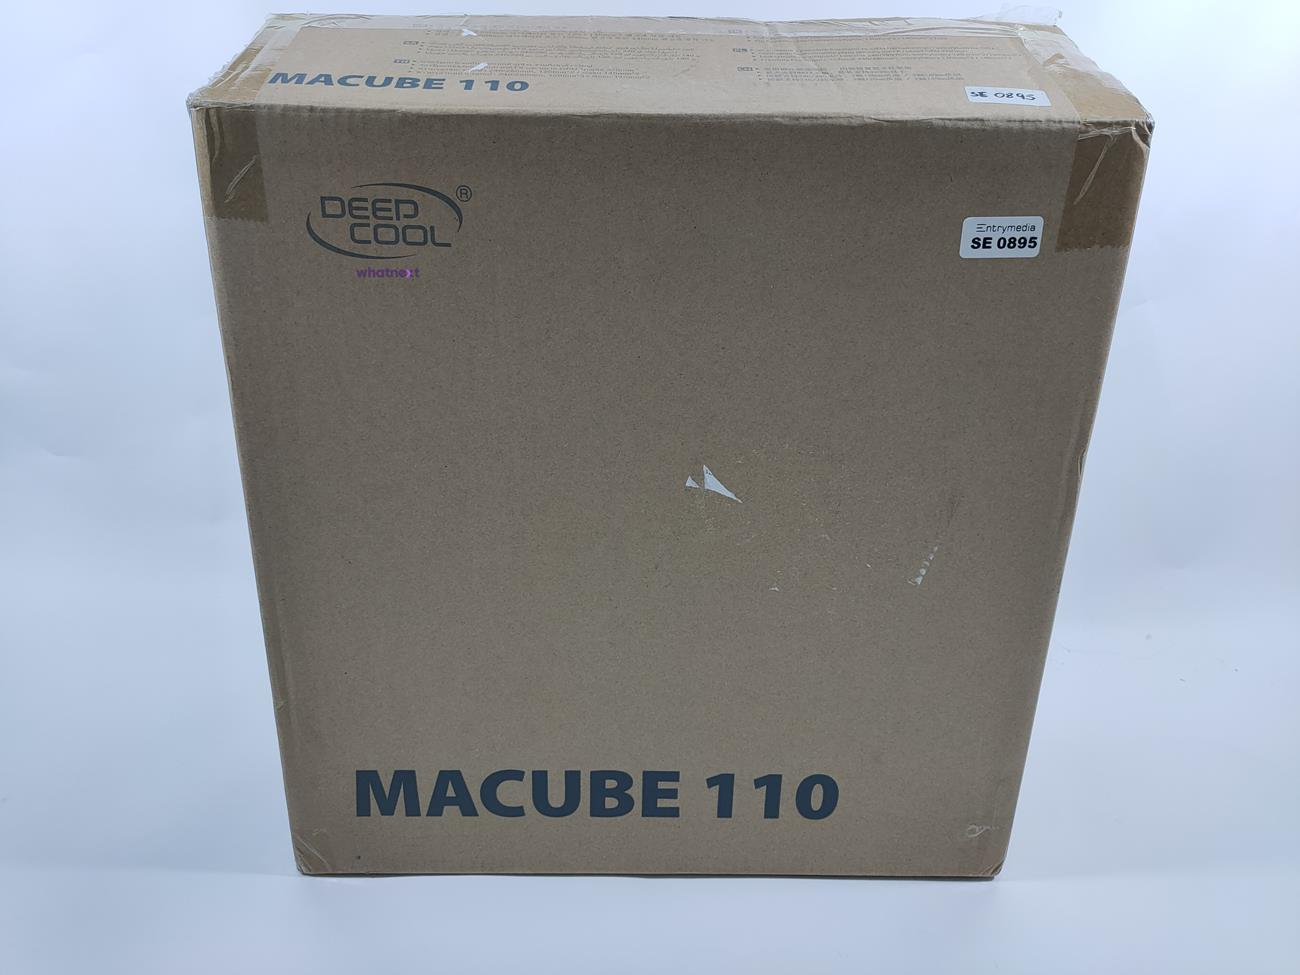 test Deepcool Macube 110, recenzja Deepcool Macube 110, review Deepcool Macube 110, opinia Deepcool Macube 110